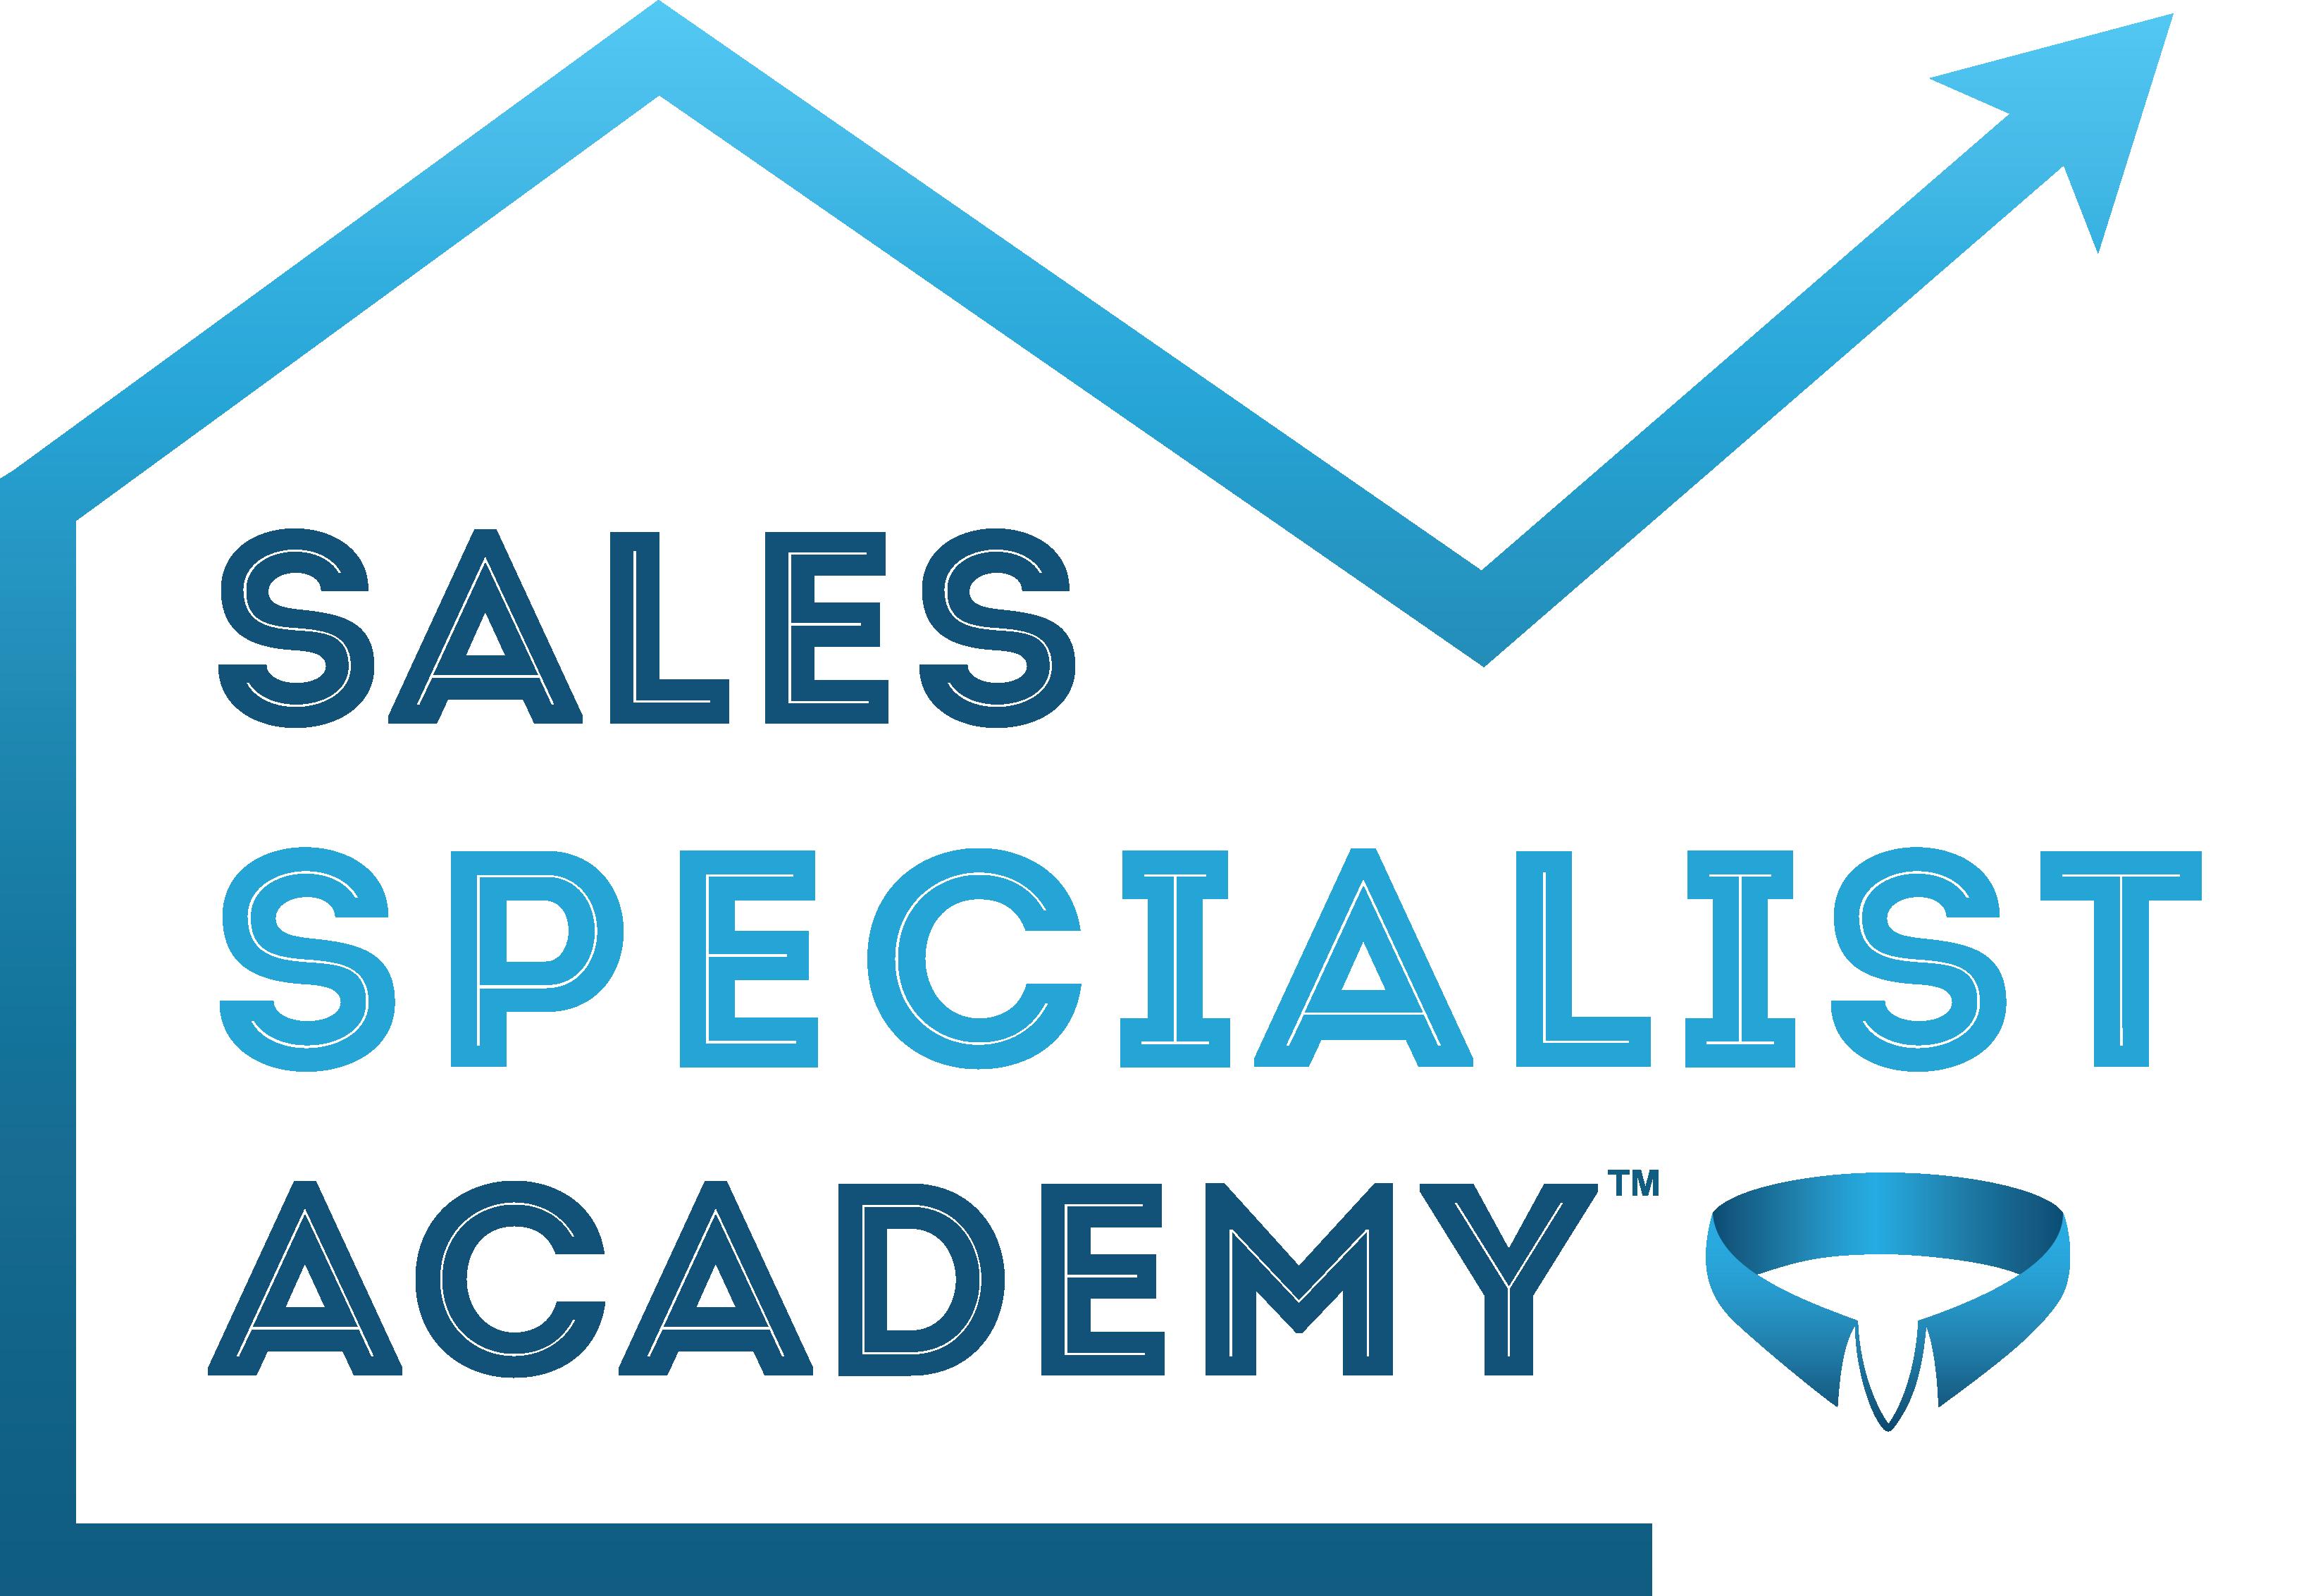 Sales-Specialist-Academy-Logo-TM